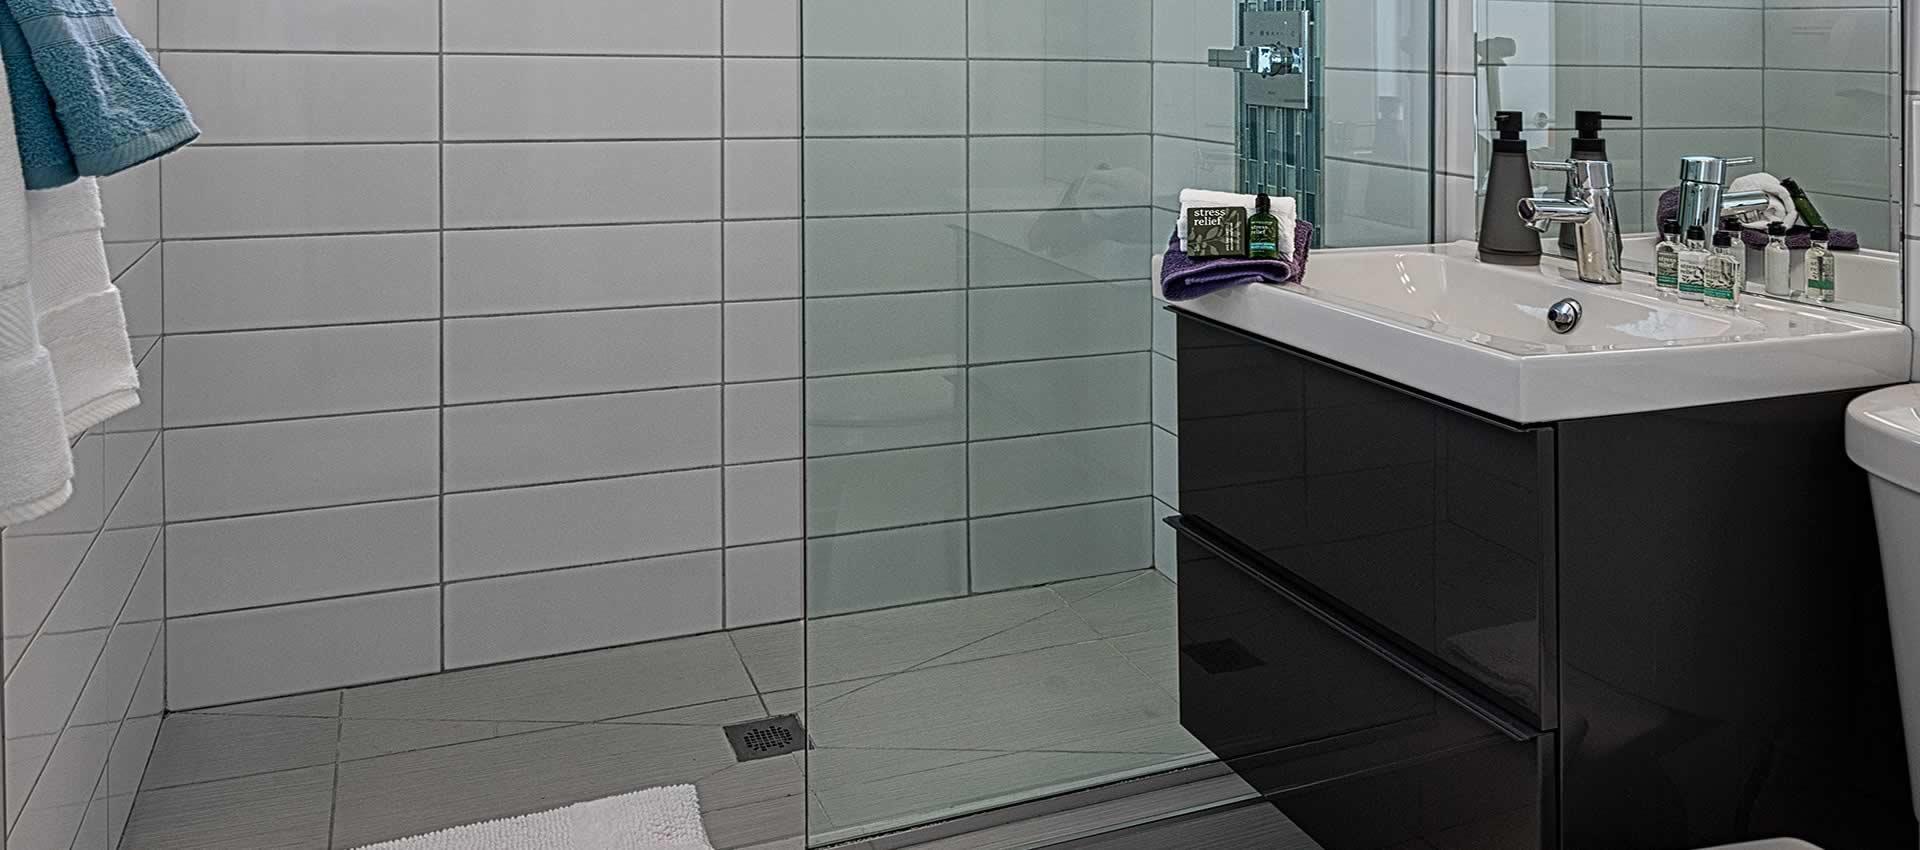 twist-hotel-room222-bath